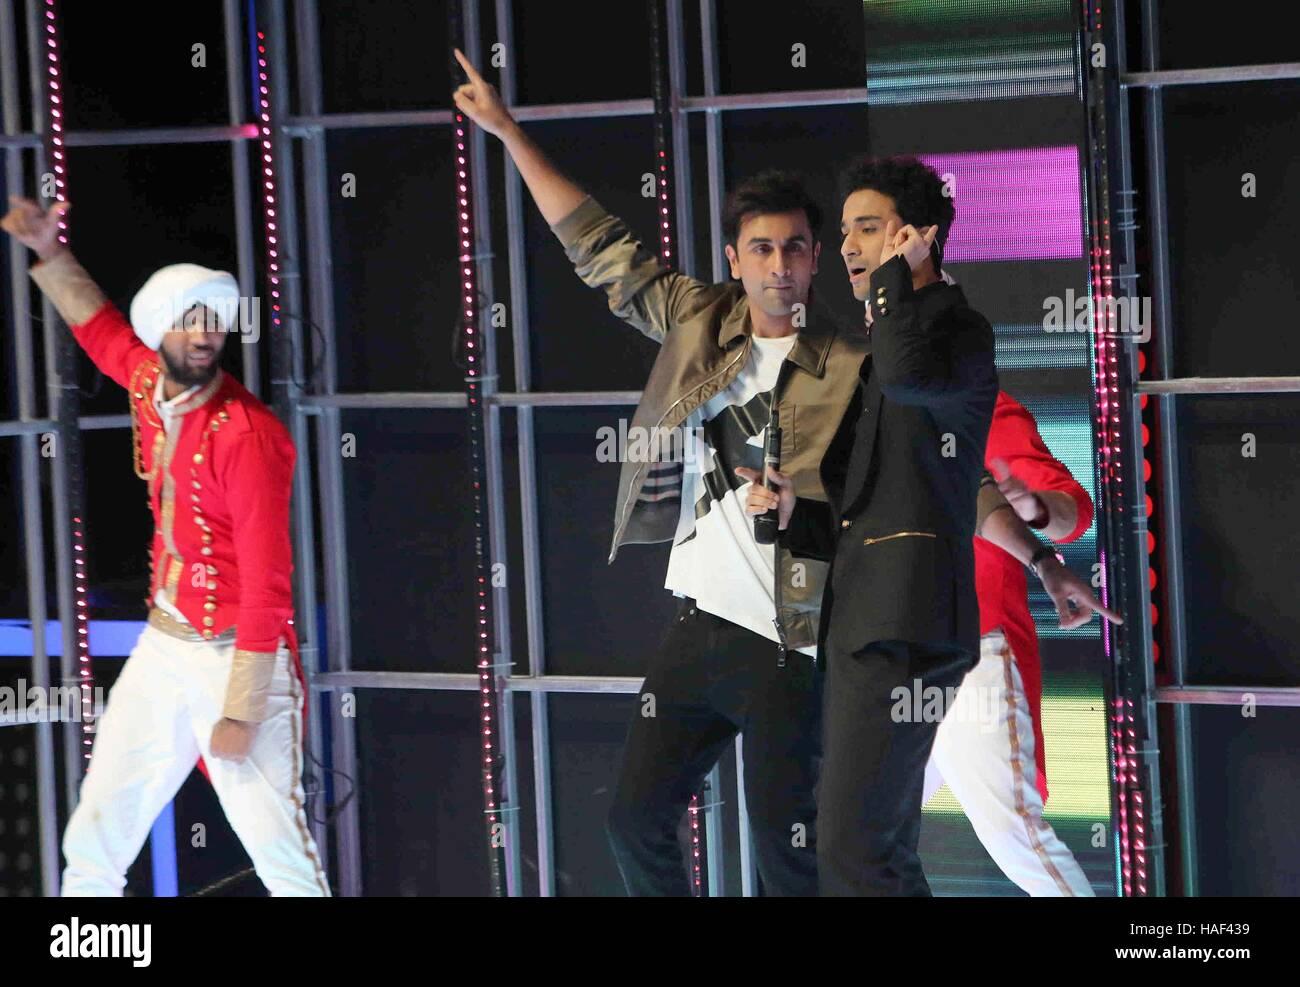 Bollywood actor Ranbir Kapoor during the grand finale of Dance Plus Season 2, in Mumbai, India on September 24, - Stock Image